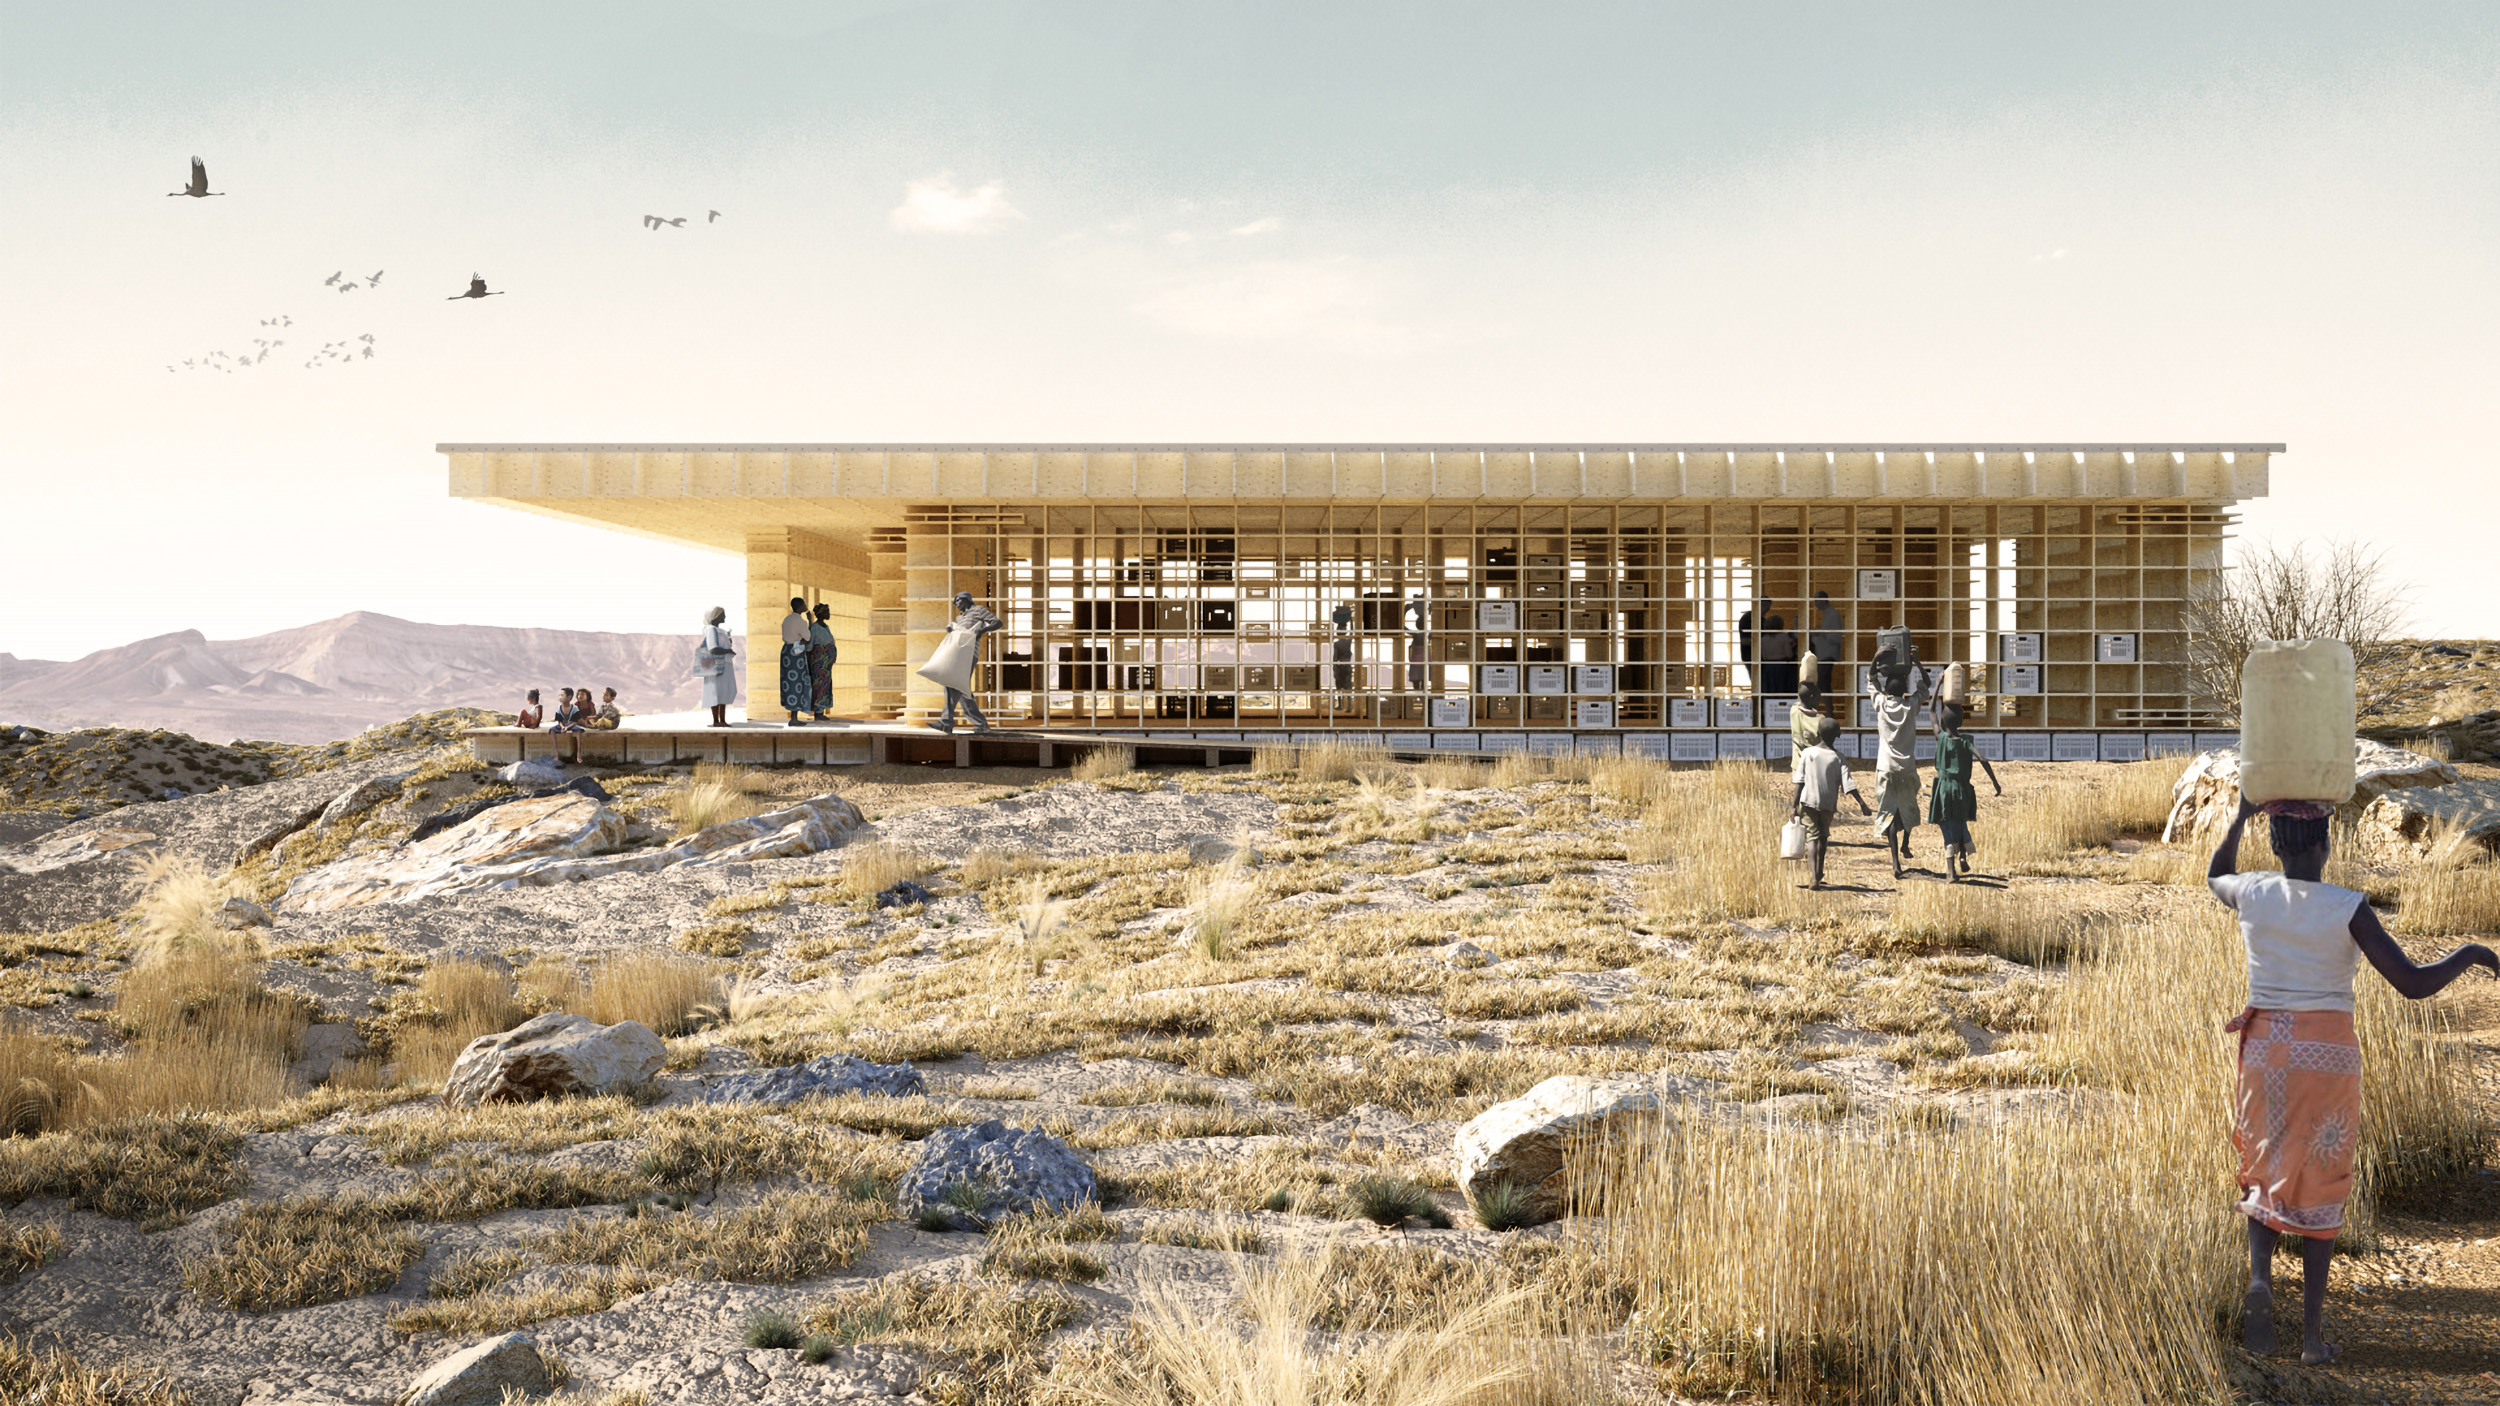 winner of kaira looro architecture competition 2021